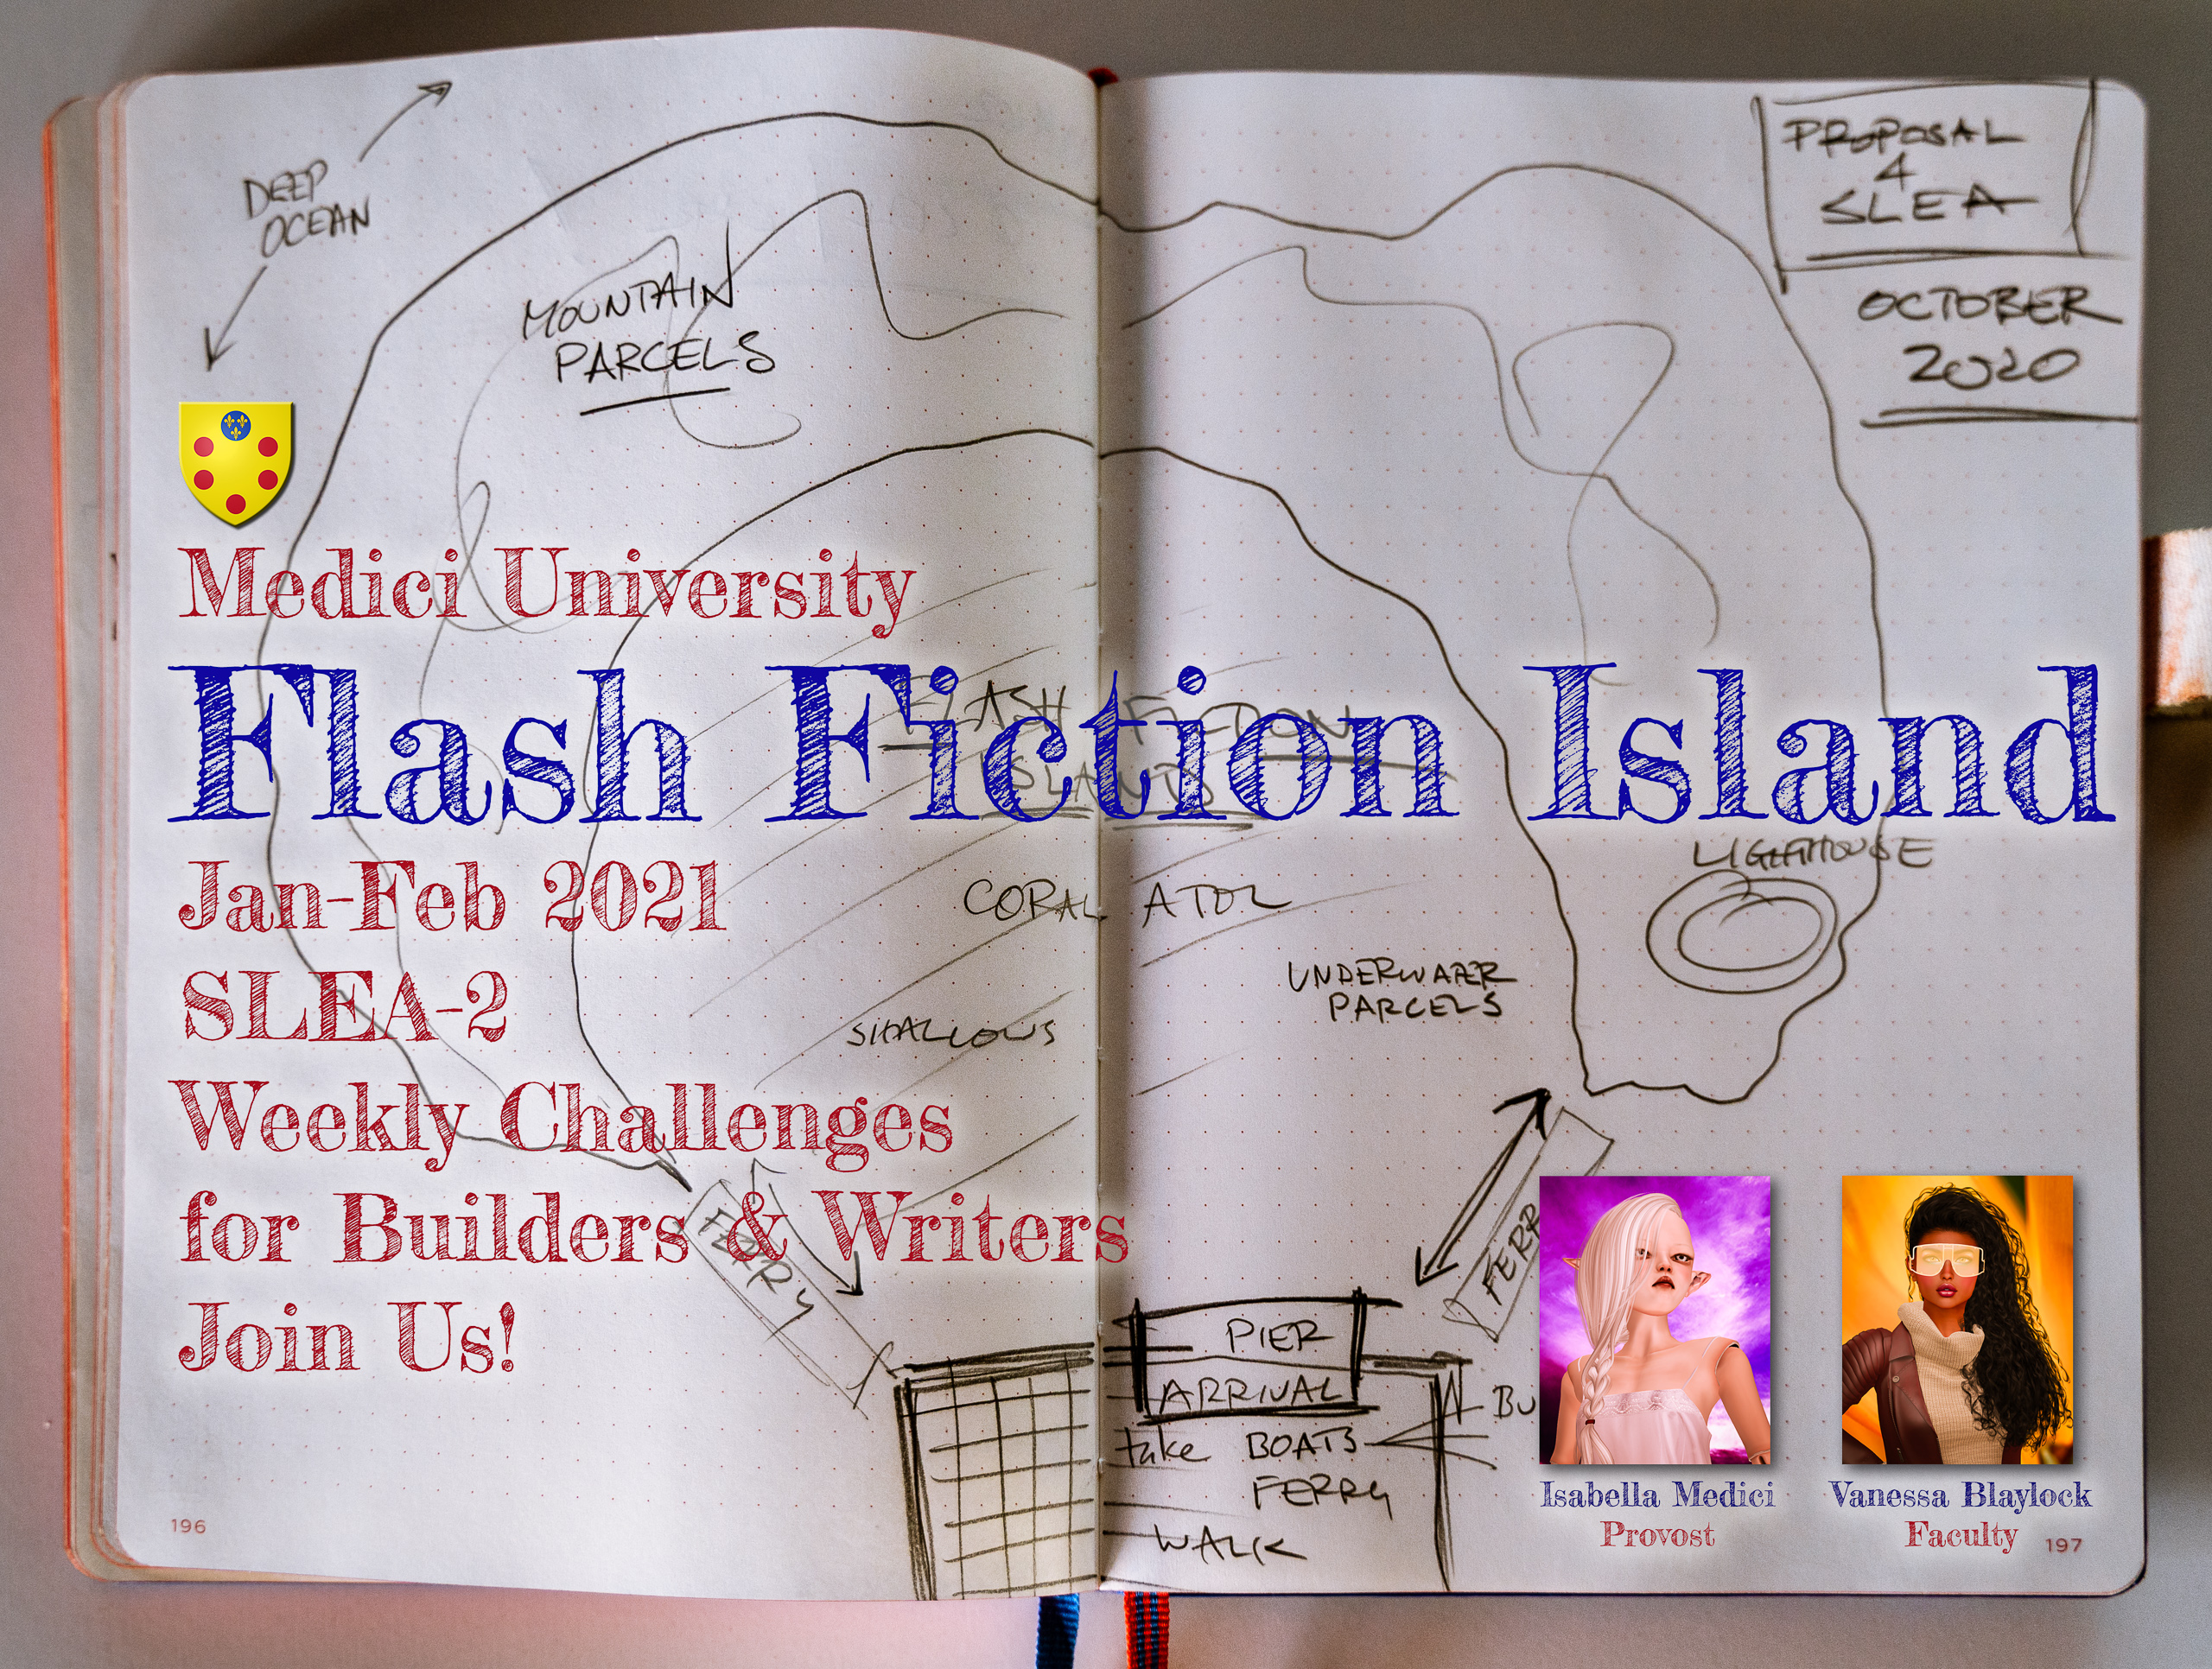 VB 238 Flash Fiction Island